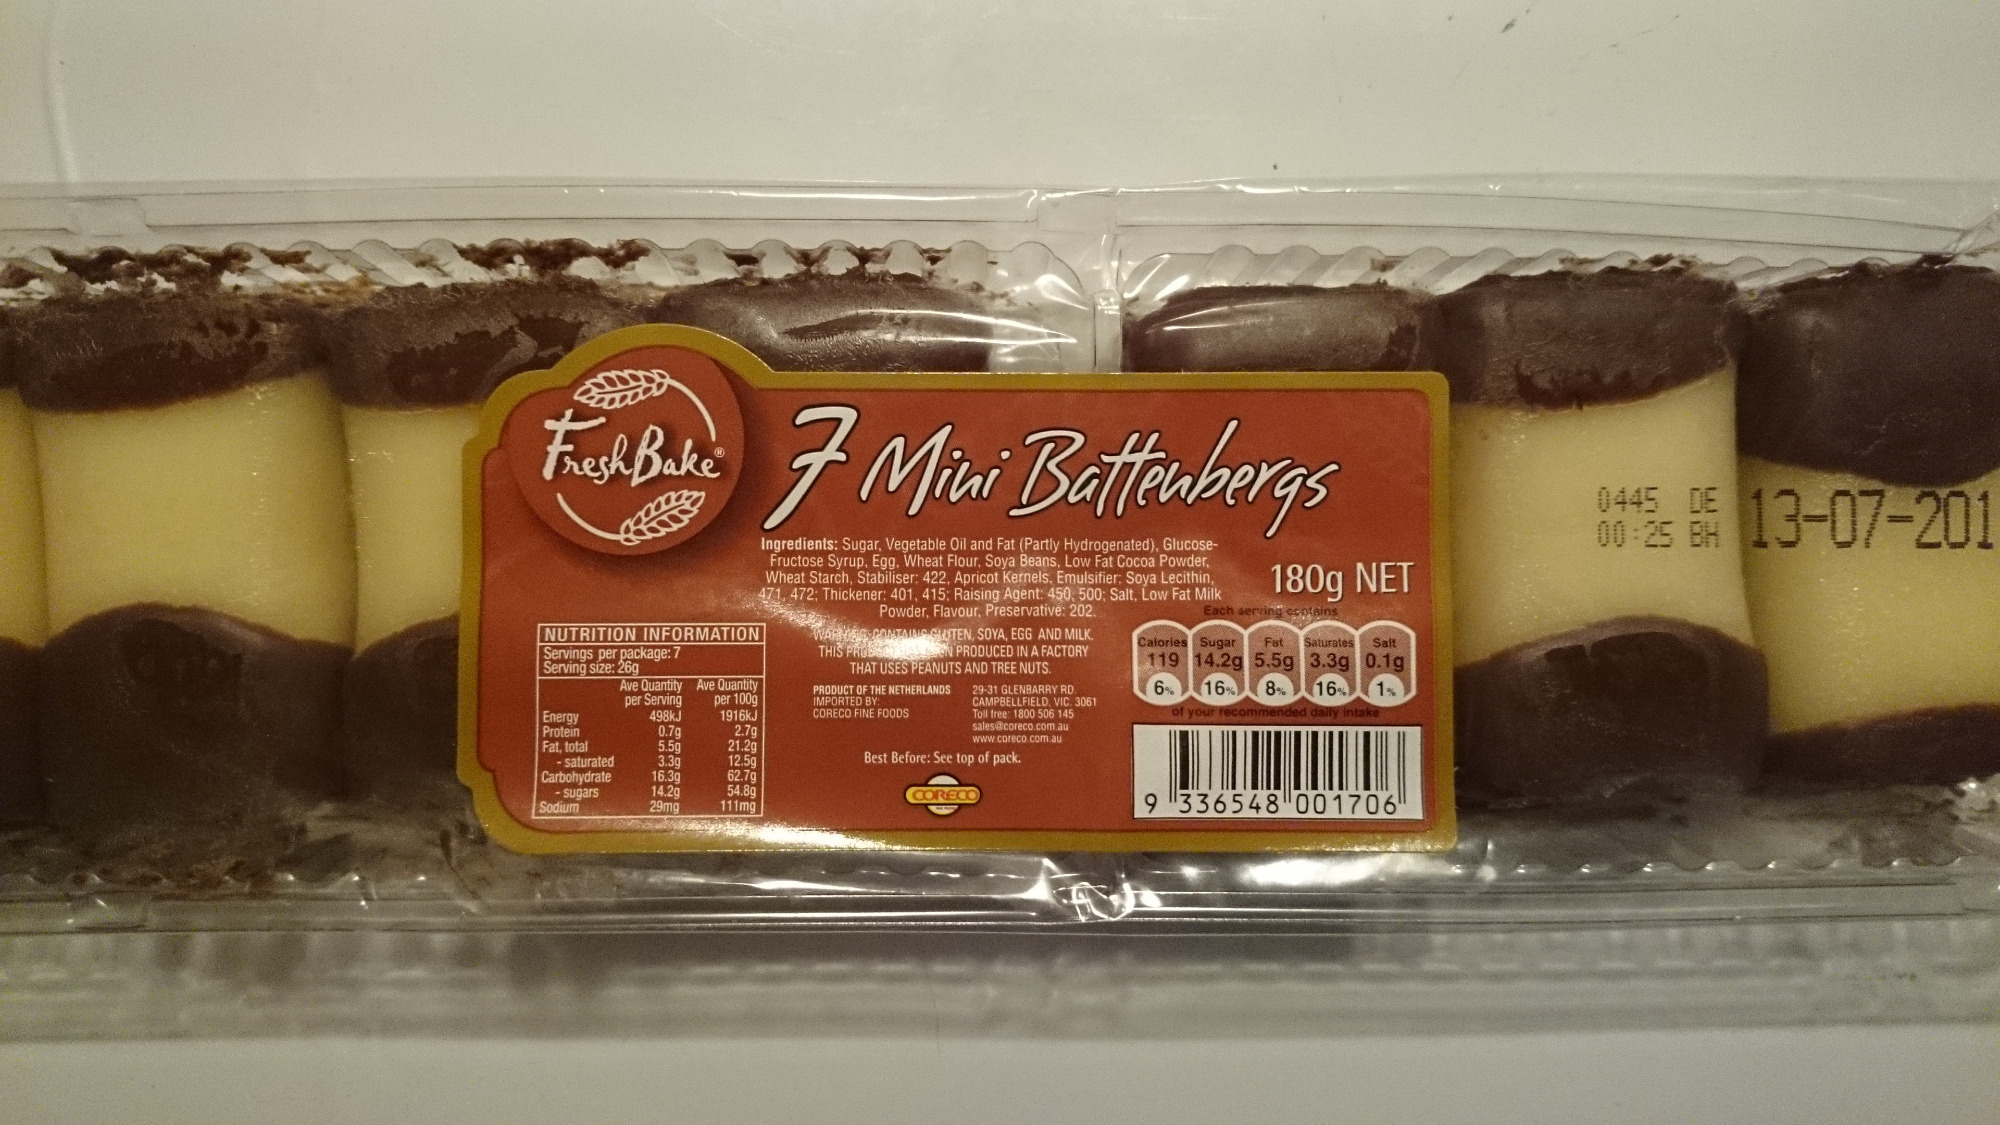 7 Mini Battengergs - Product